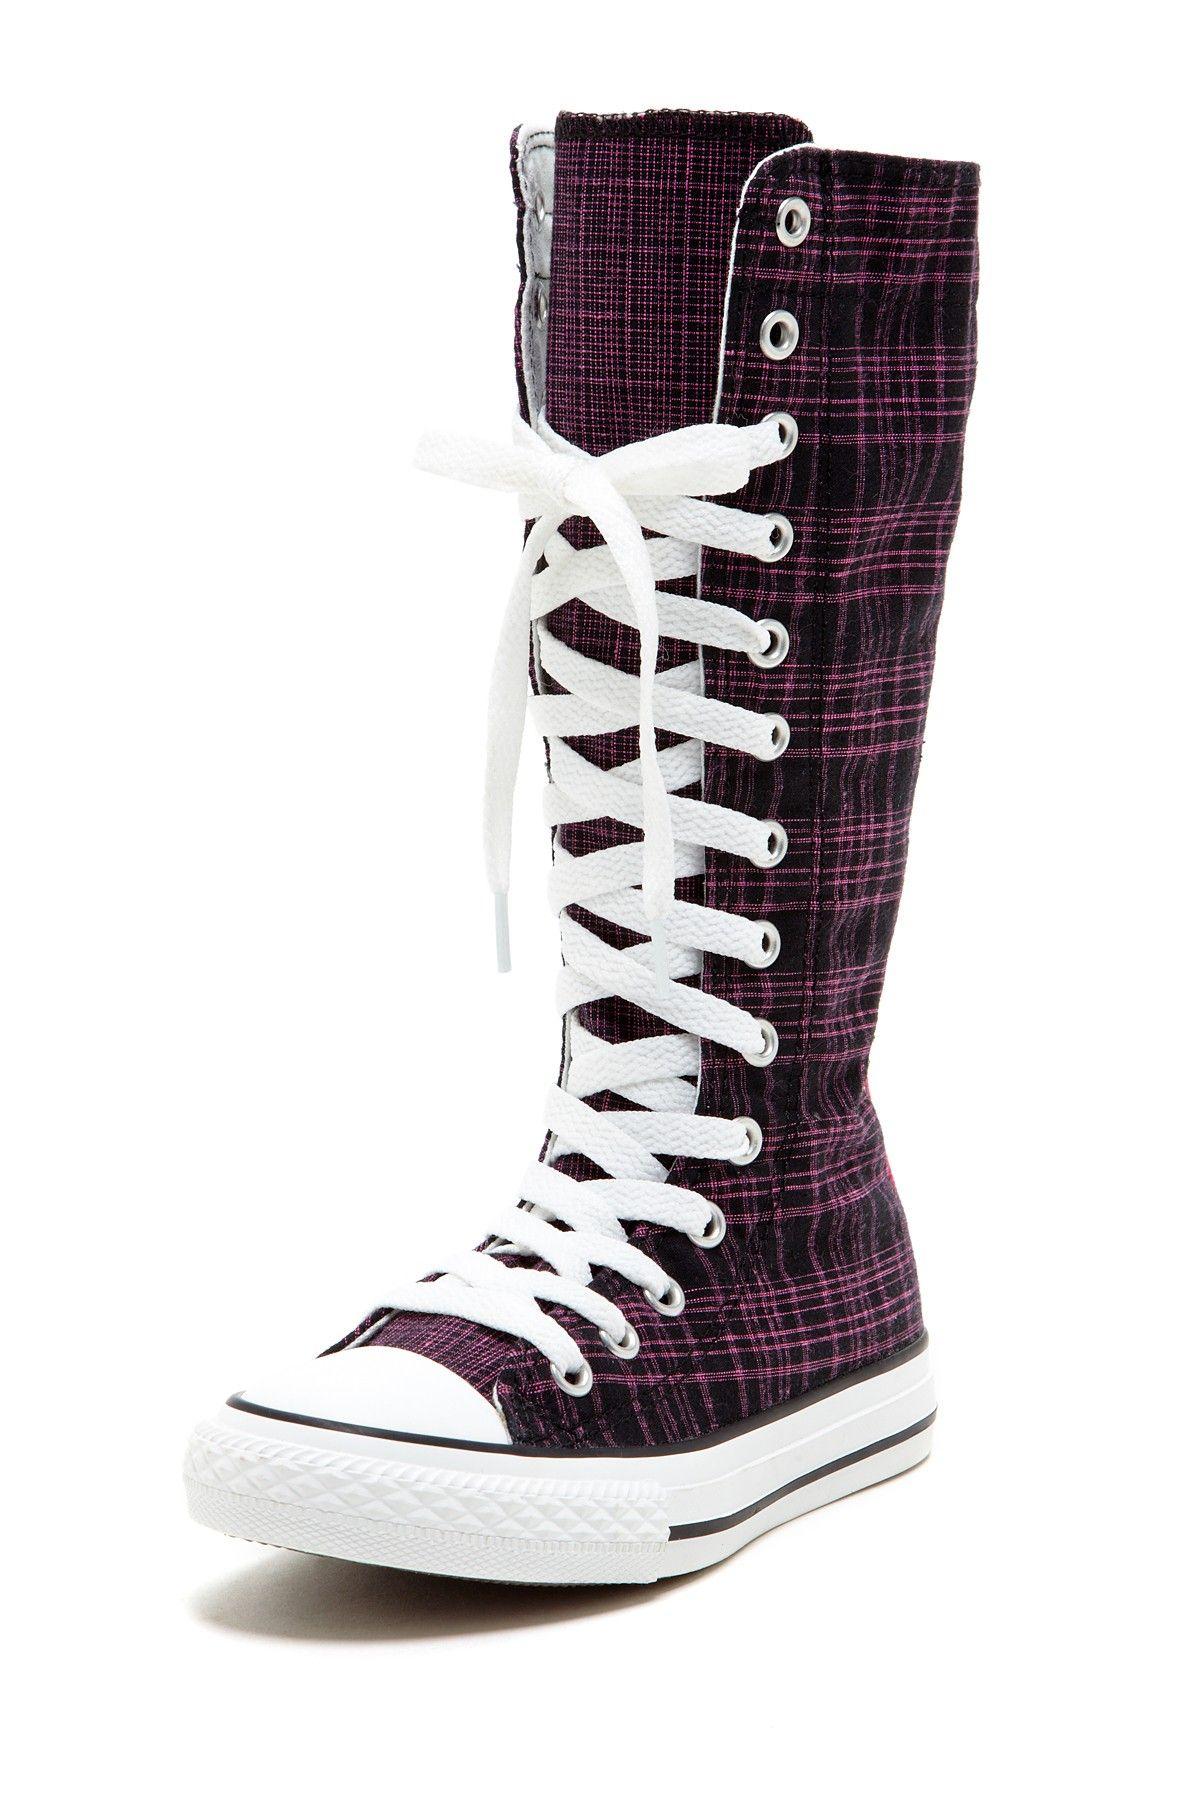 ceny odprawy buty na tanie najlepsze trampki yup my dream pair of converse- well maybe knee high and a ...